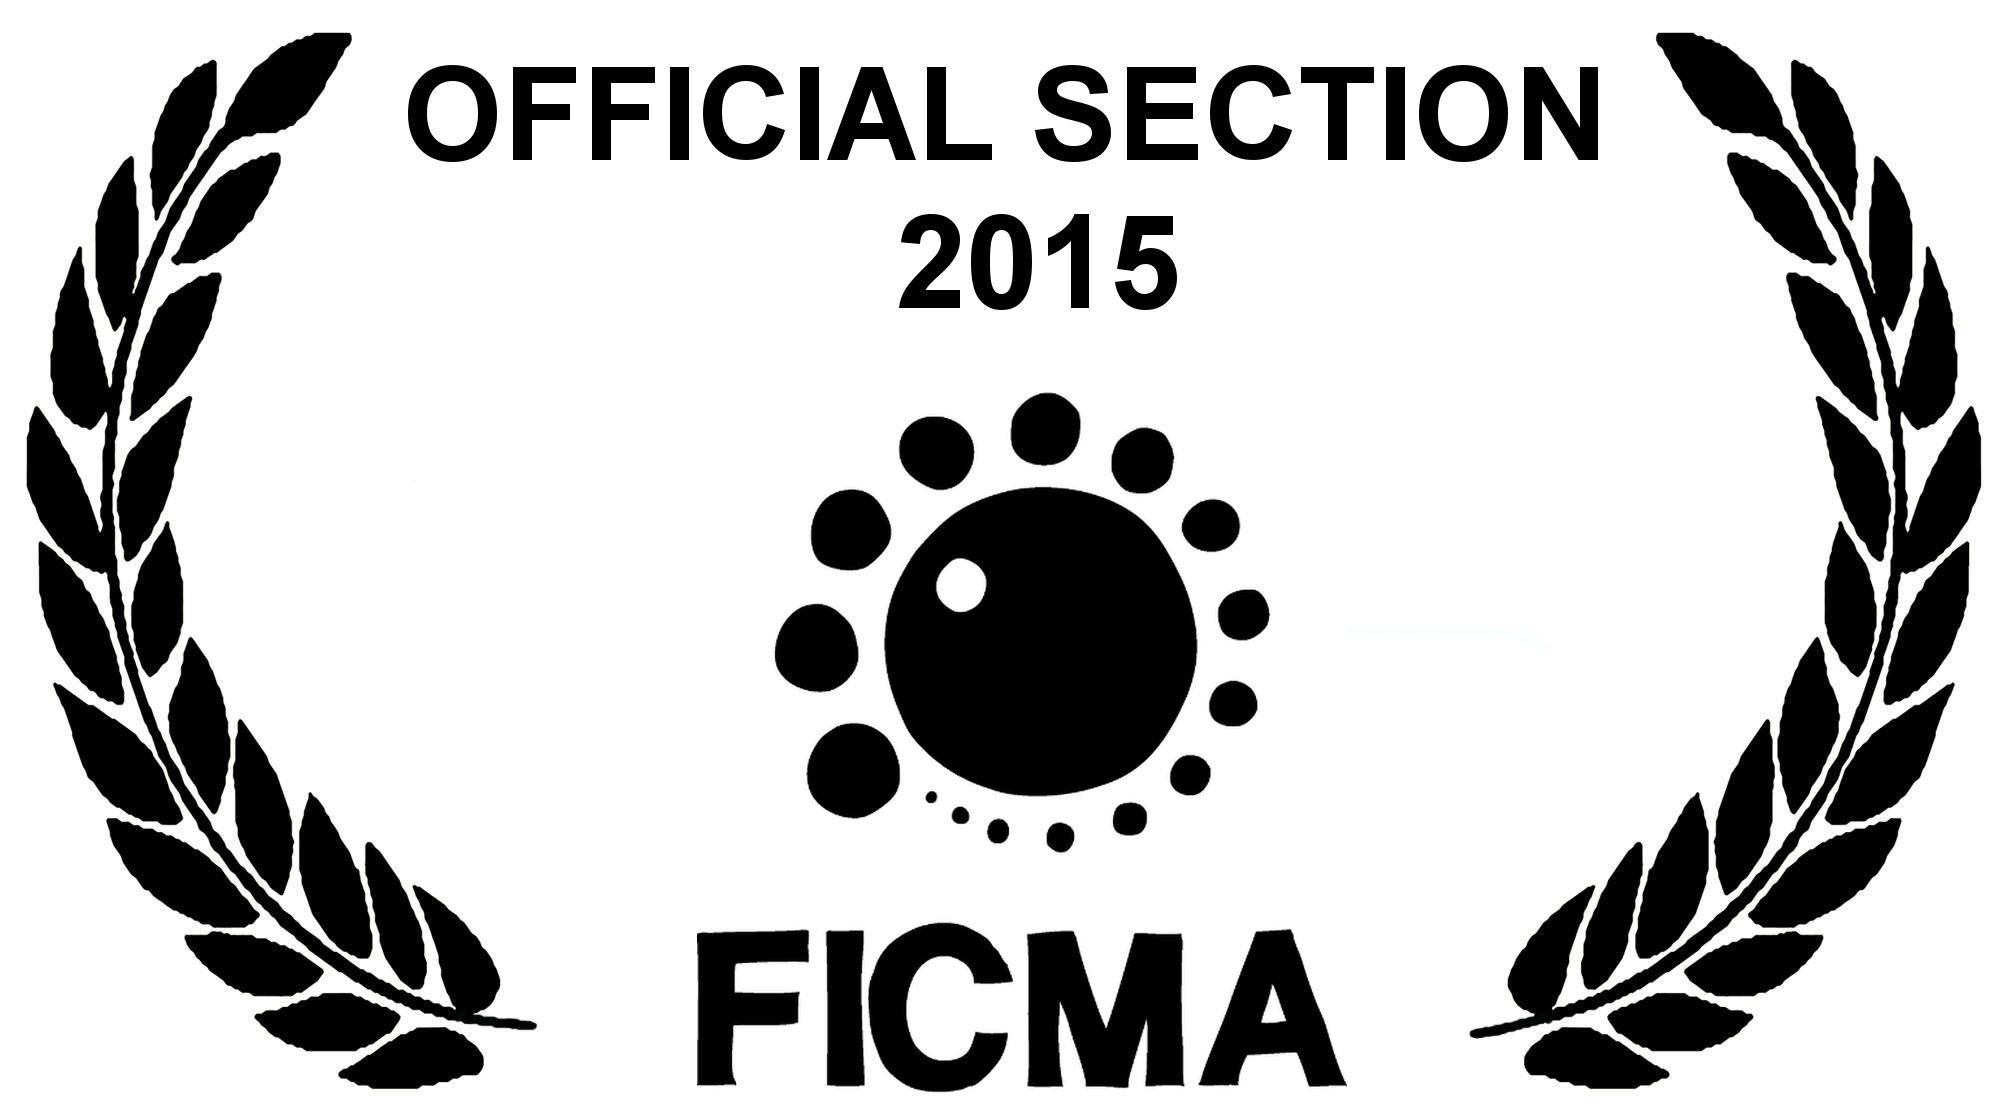 OffcialSection2015.jpg